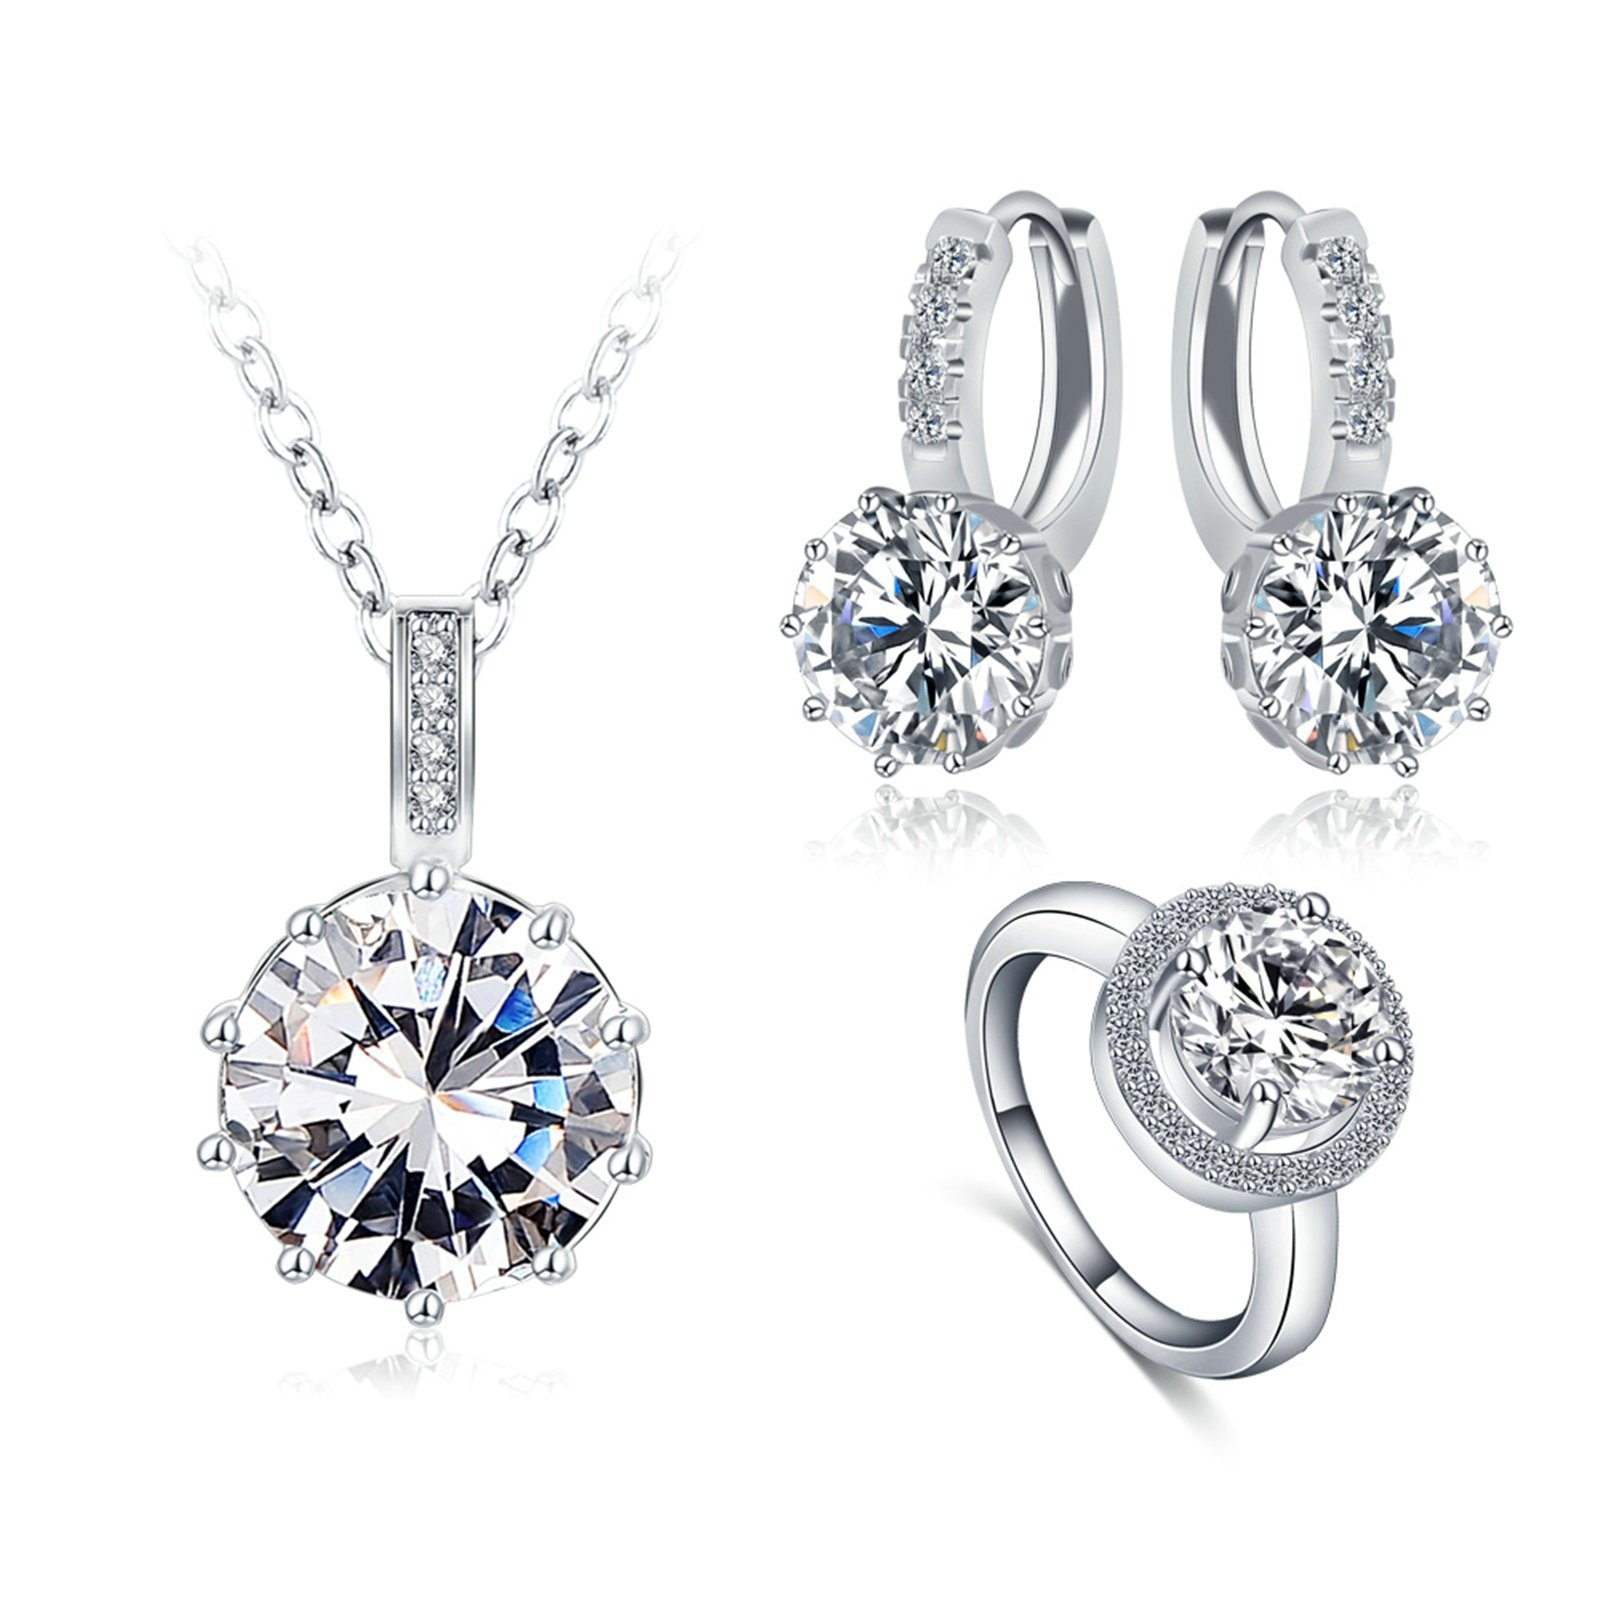 Cystal Jewelry Set for Women, ''Women's Day Gift'', Pendant Necklace Earrings Rings for Women Girl Size 6